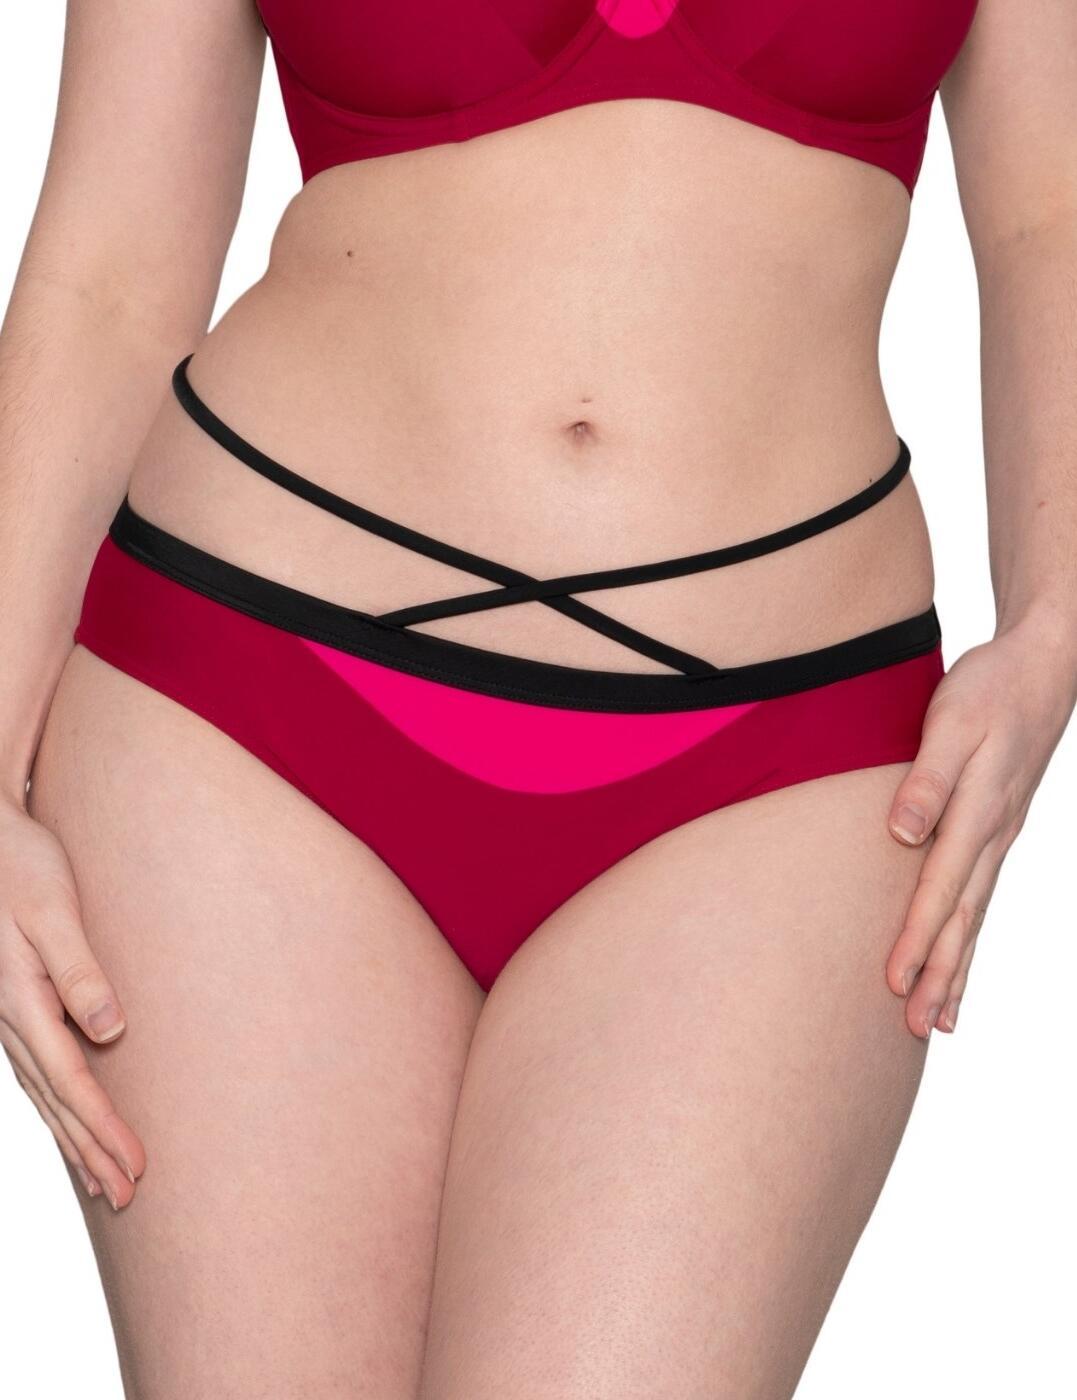 Curvy Kate Subtropic Mini Bikini Brief in Cherry Red/Pink